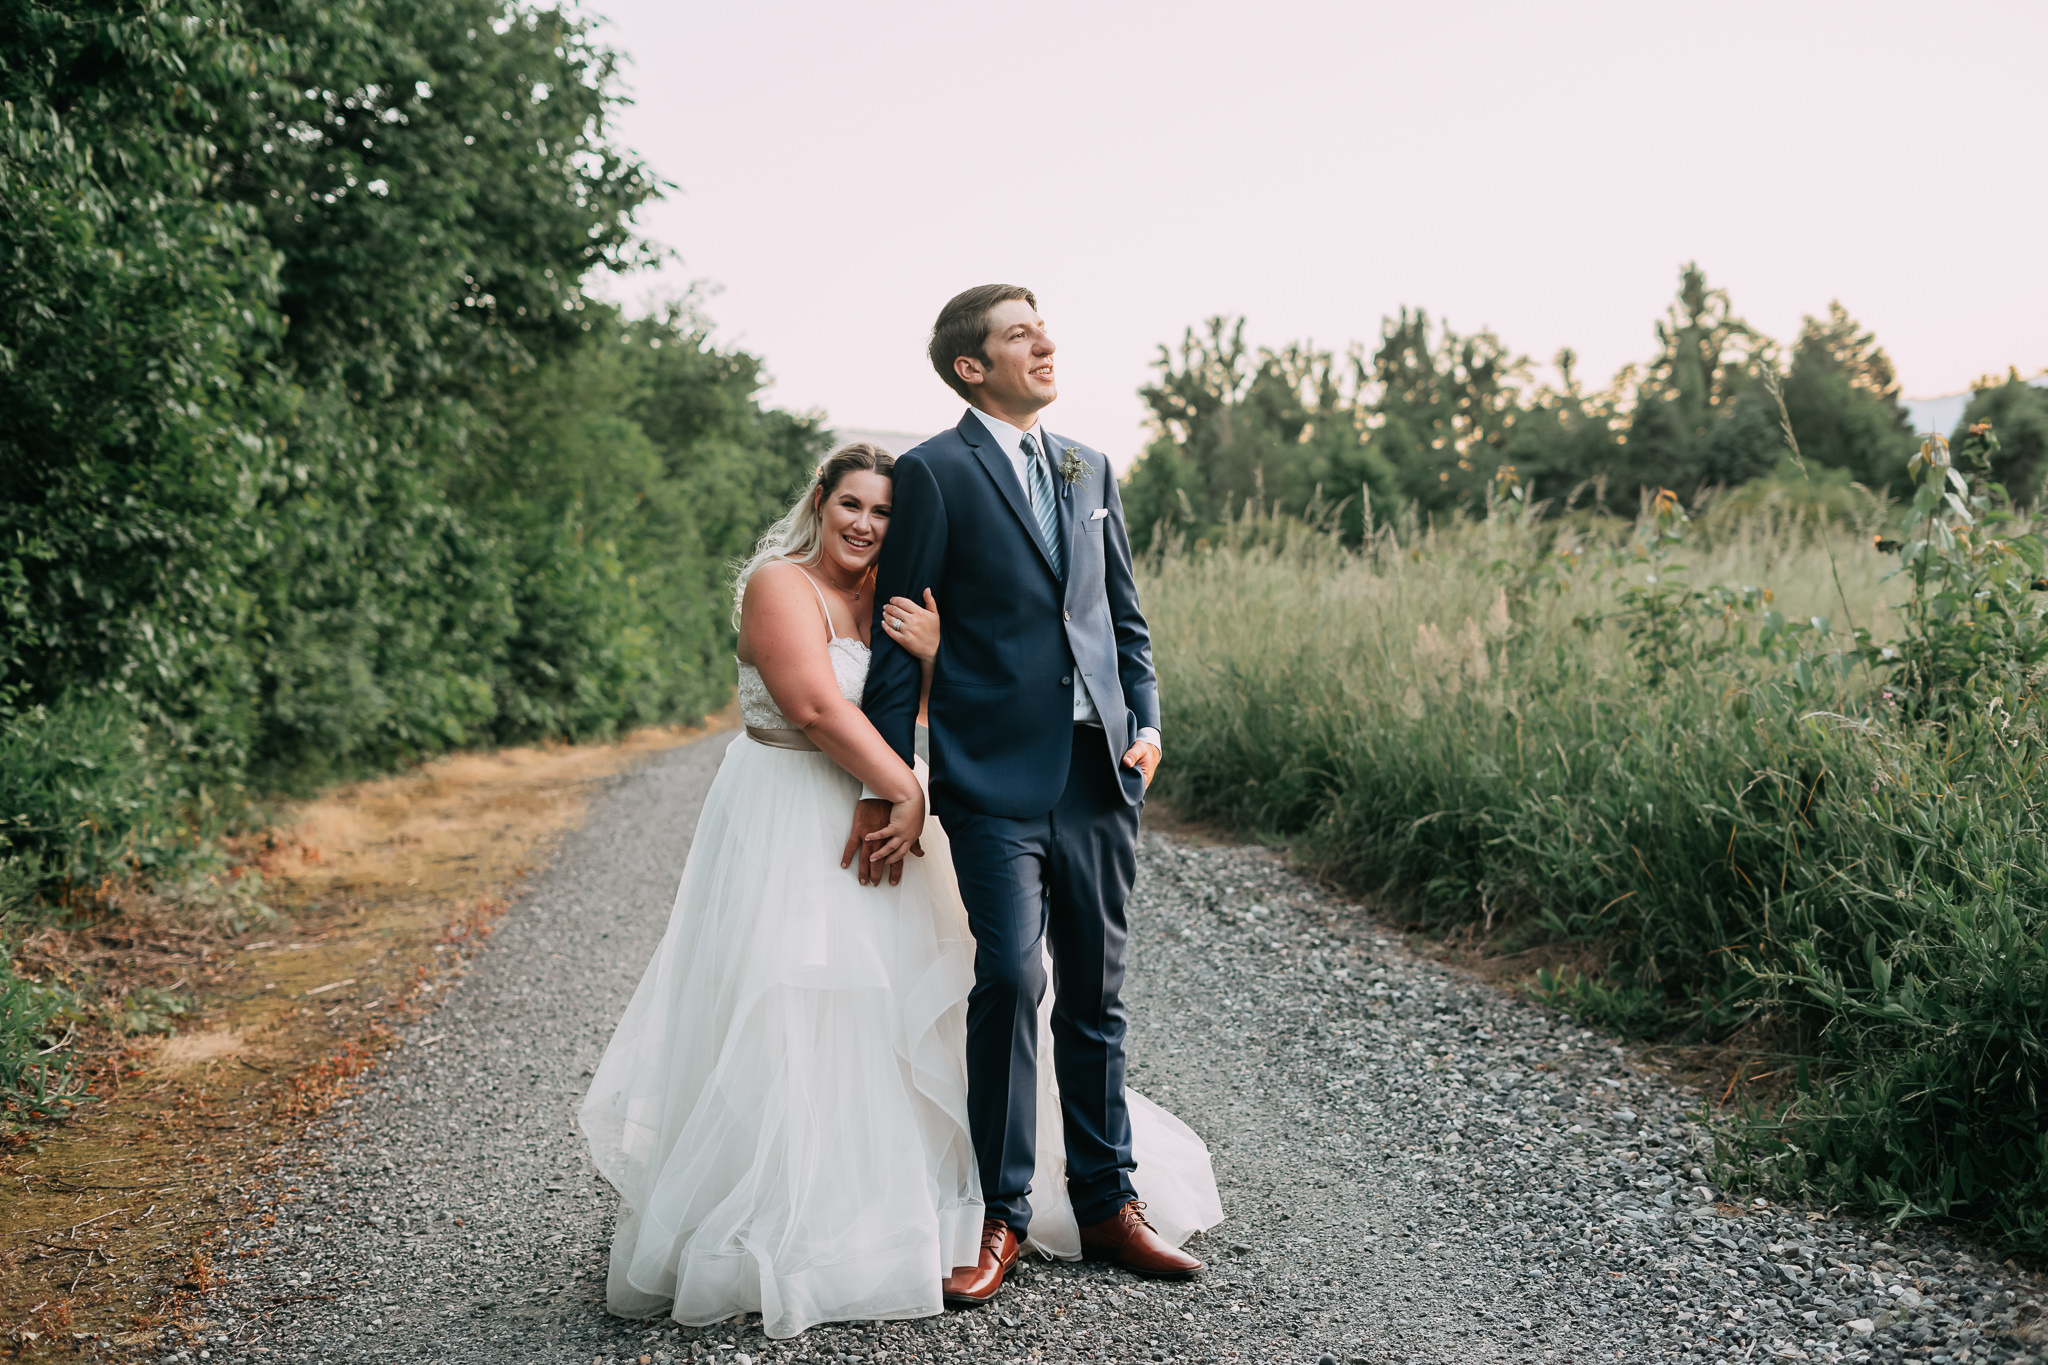 Columbia-Gorge-Backyard-Wedding-Photographer-Portland-best-Alfred-Tang-95.jpg